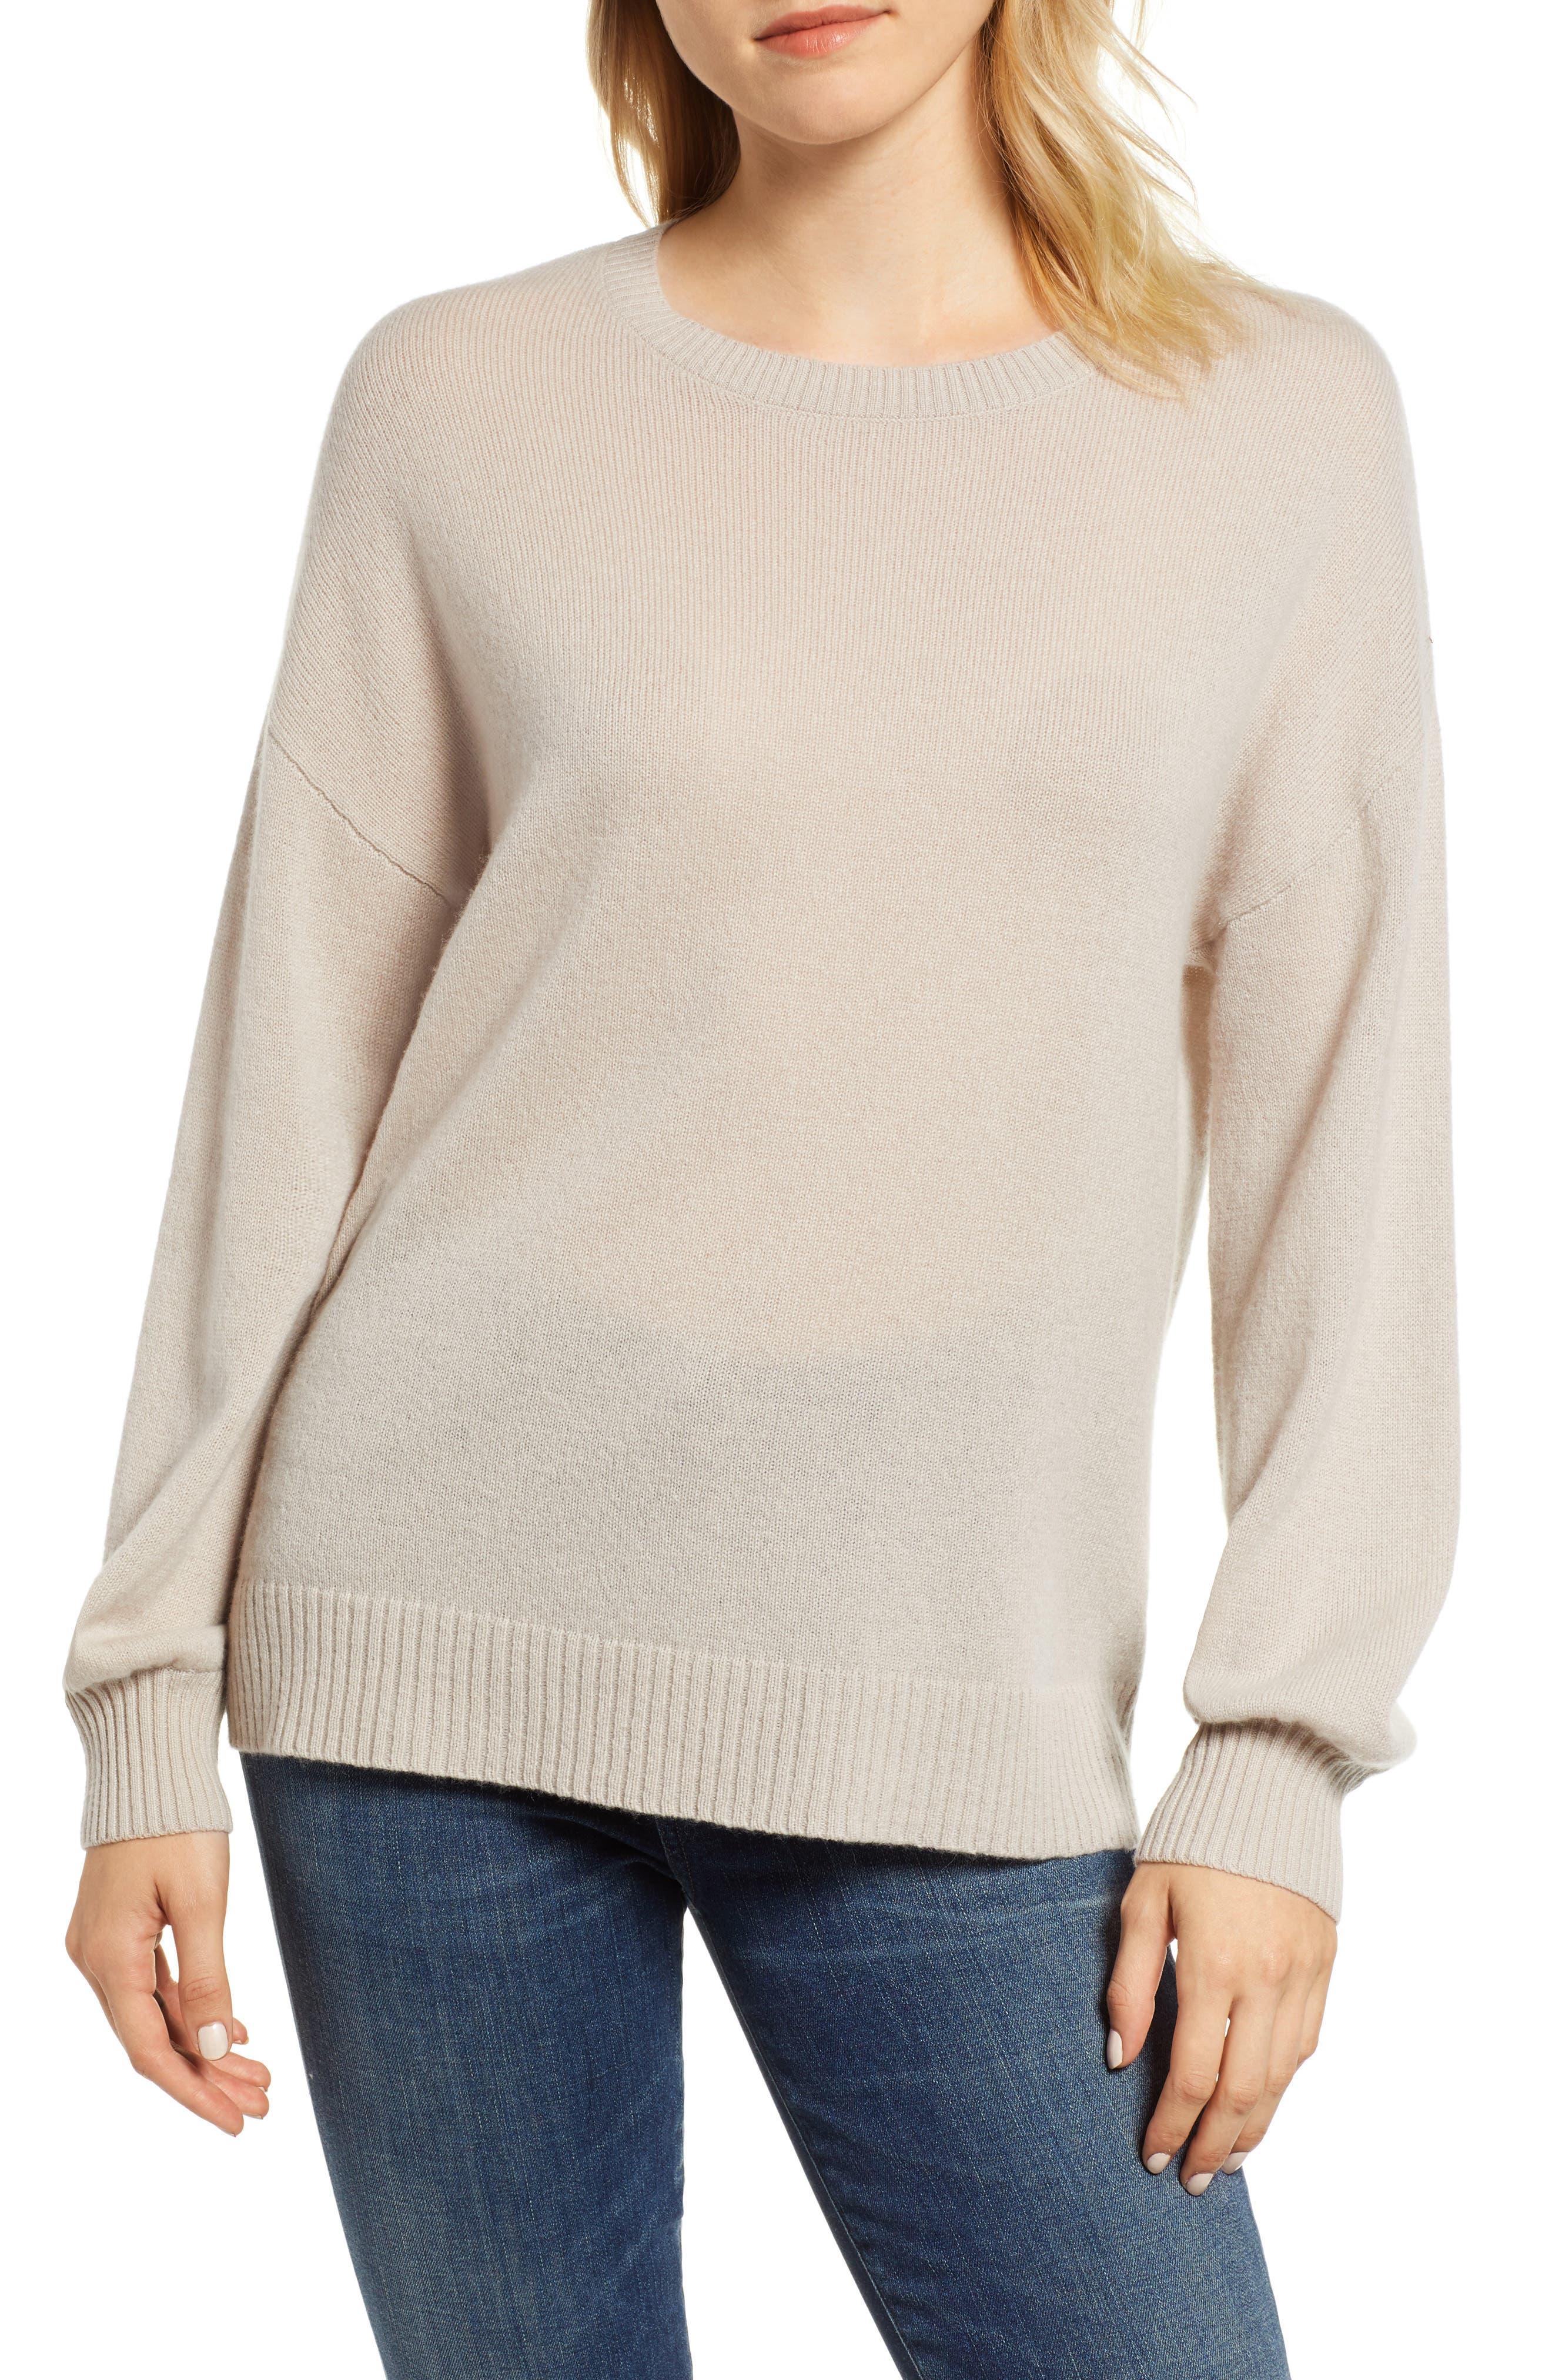 Blouson Sleeve Cashmere Sweater,                             Main thumbnail 1, color,                             MUSHROOM